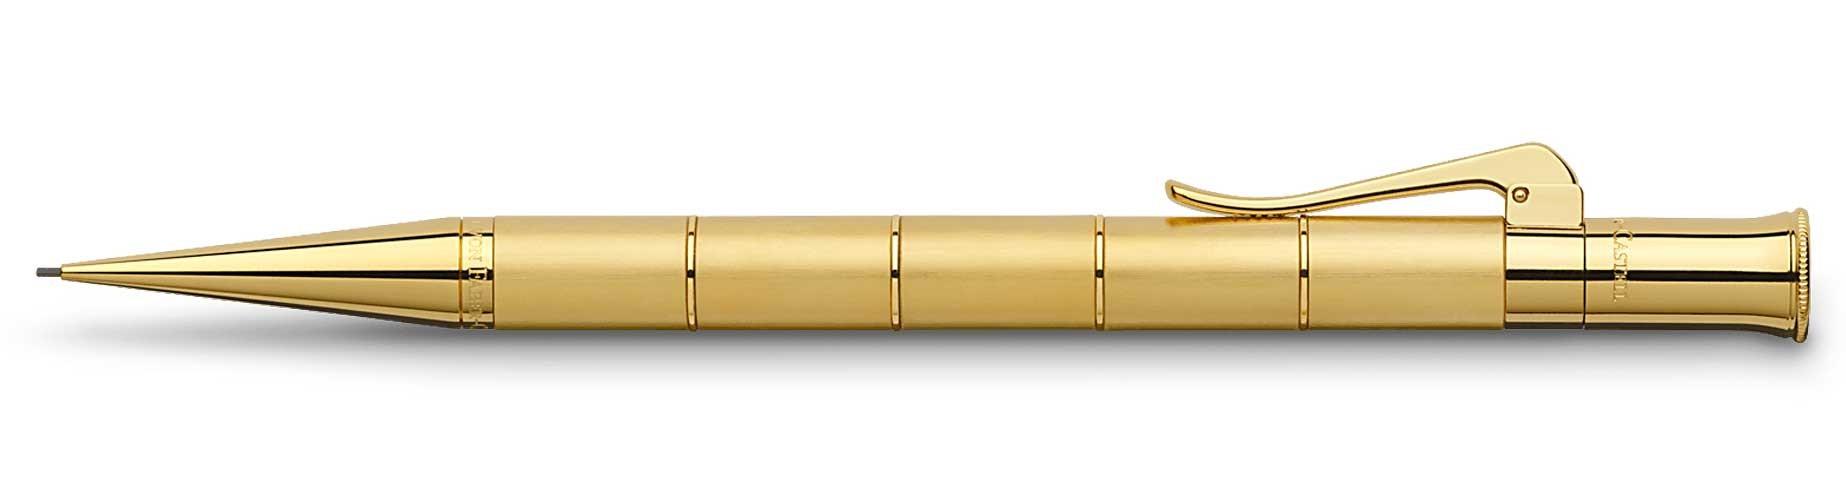 Карандаш Graf von Faber-Castell Classic Anello Gold